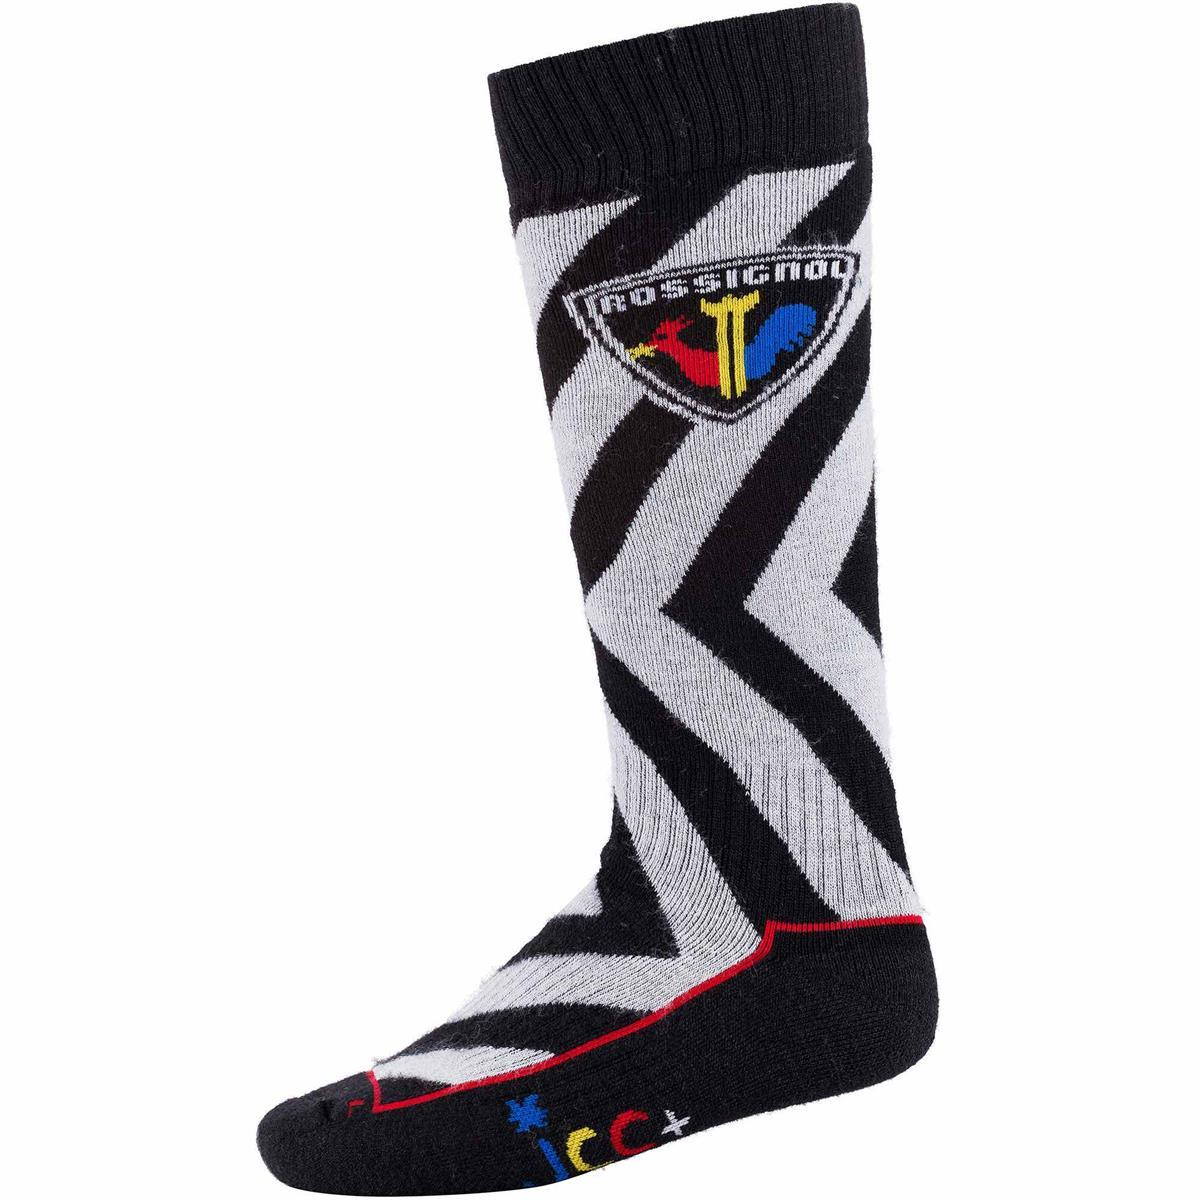 salomon elios 2 pack ski socks 2 Sub 32 Ski Clothing